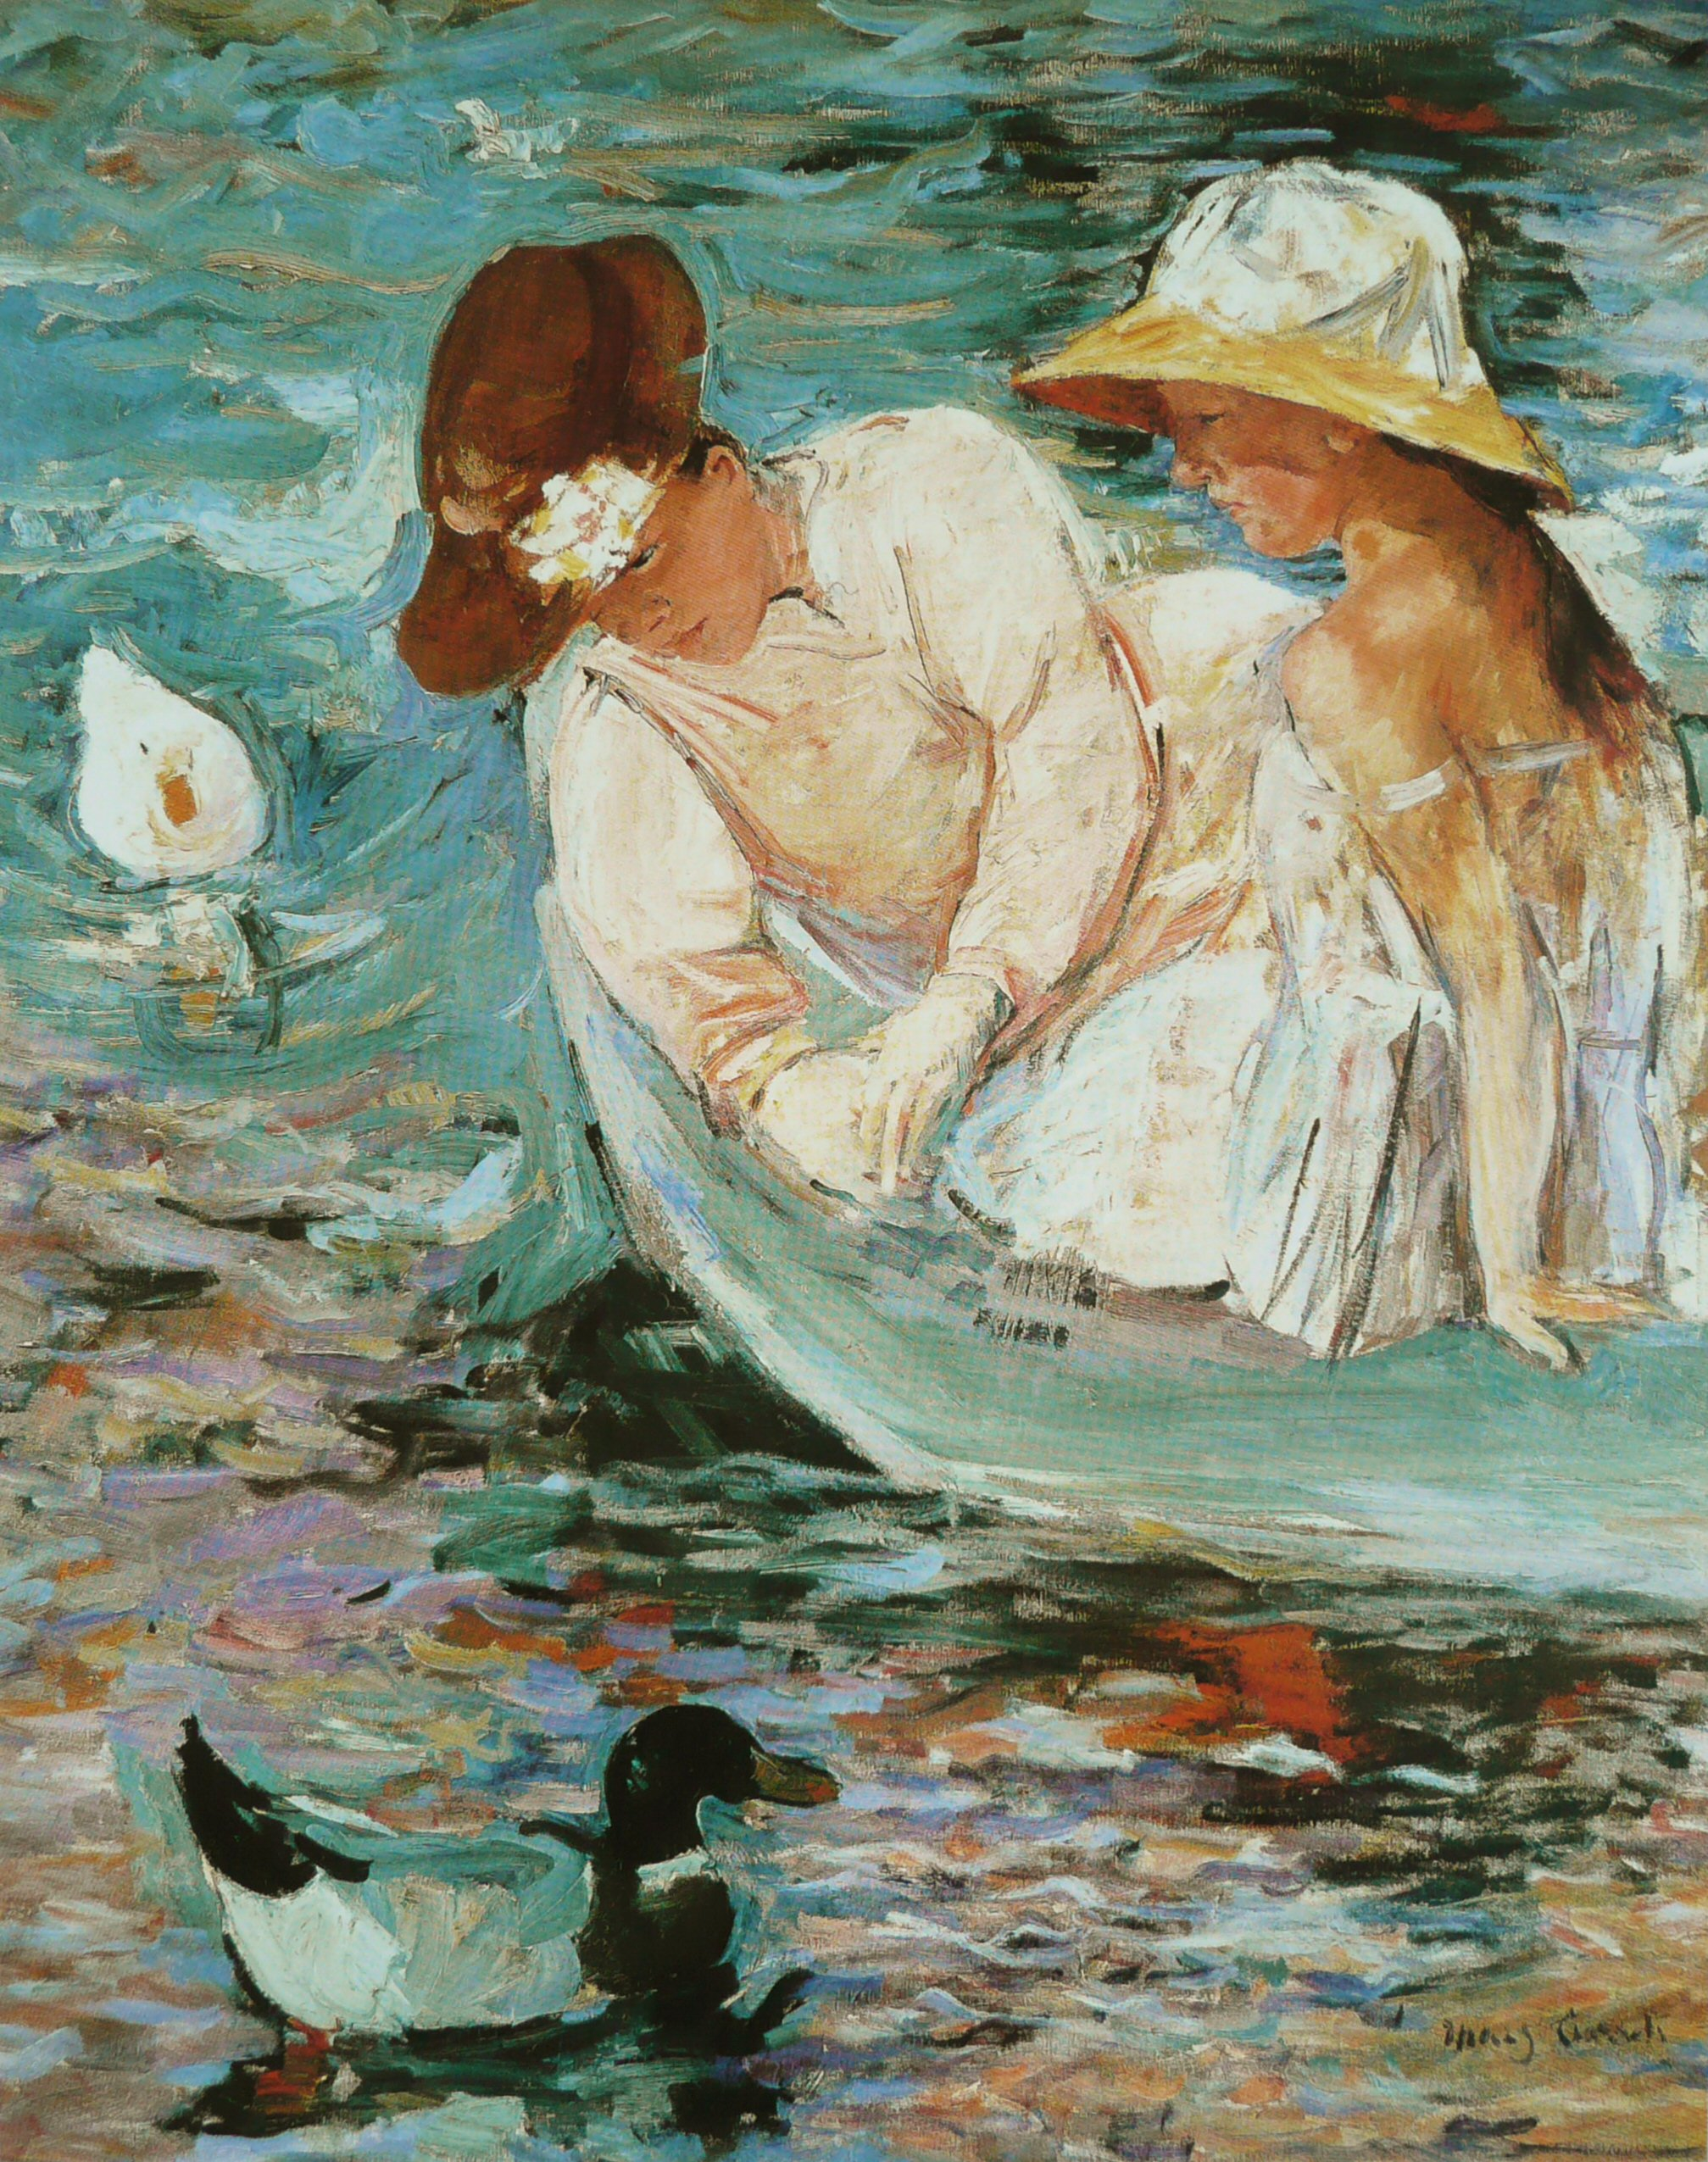 File:Mary Cassatt - L'Été.jpg - Wikimedia Commons